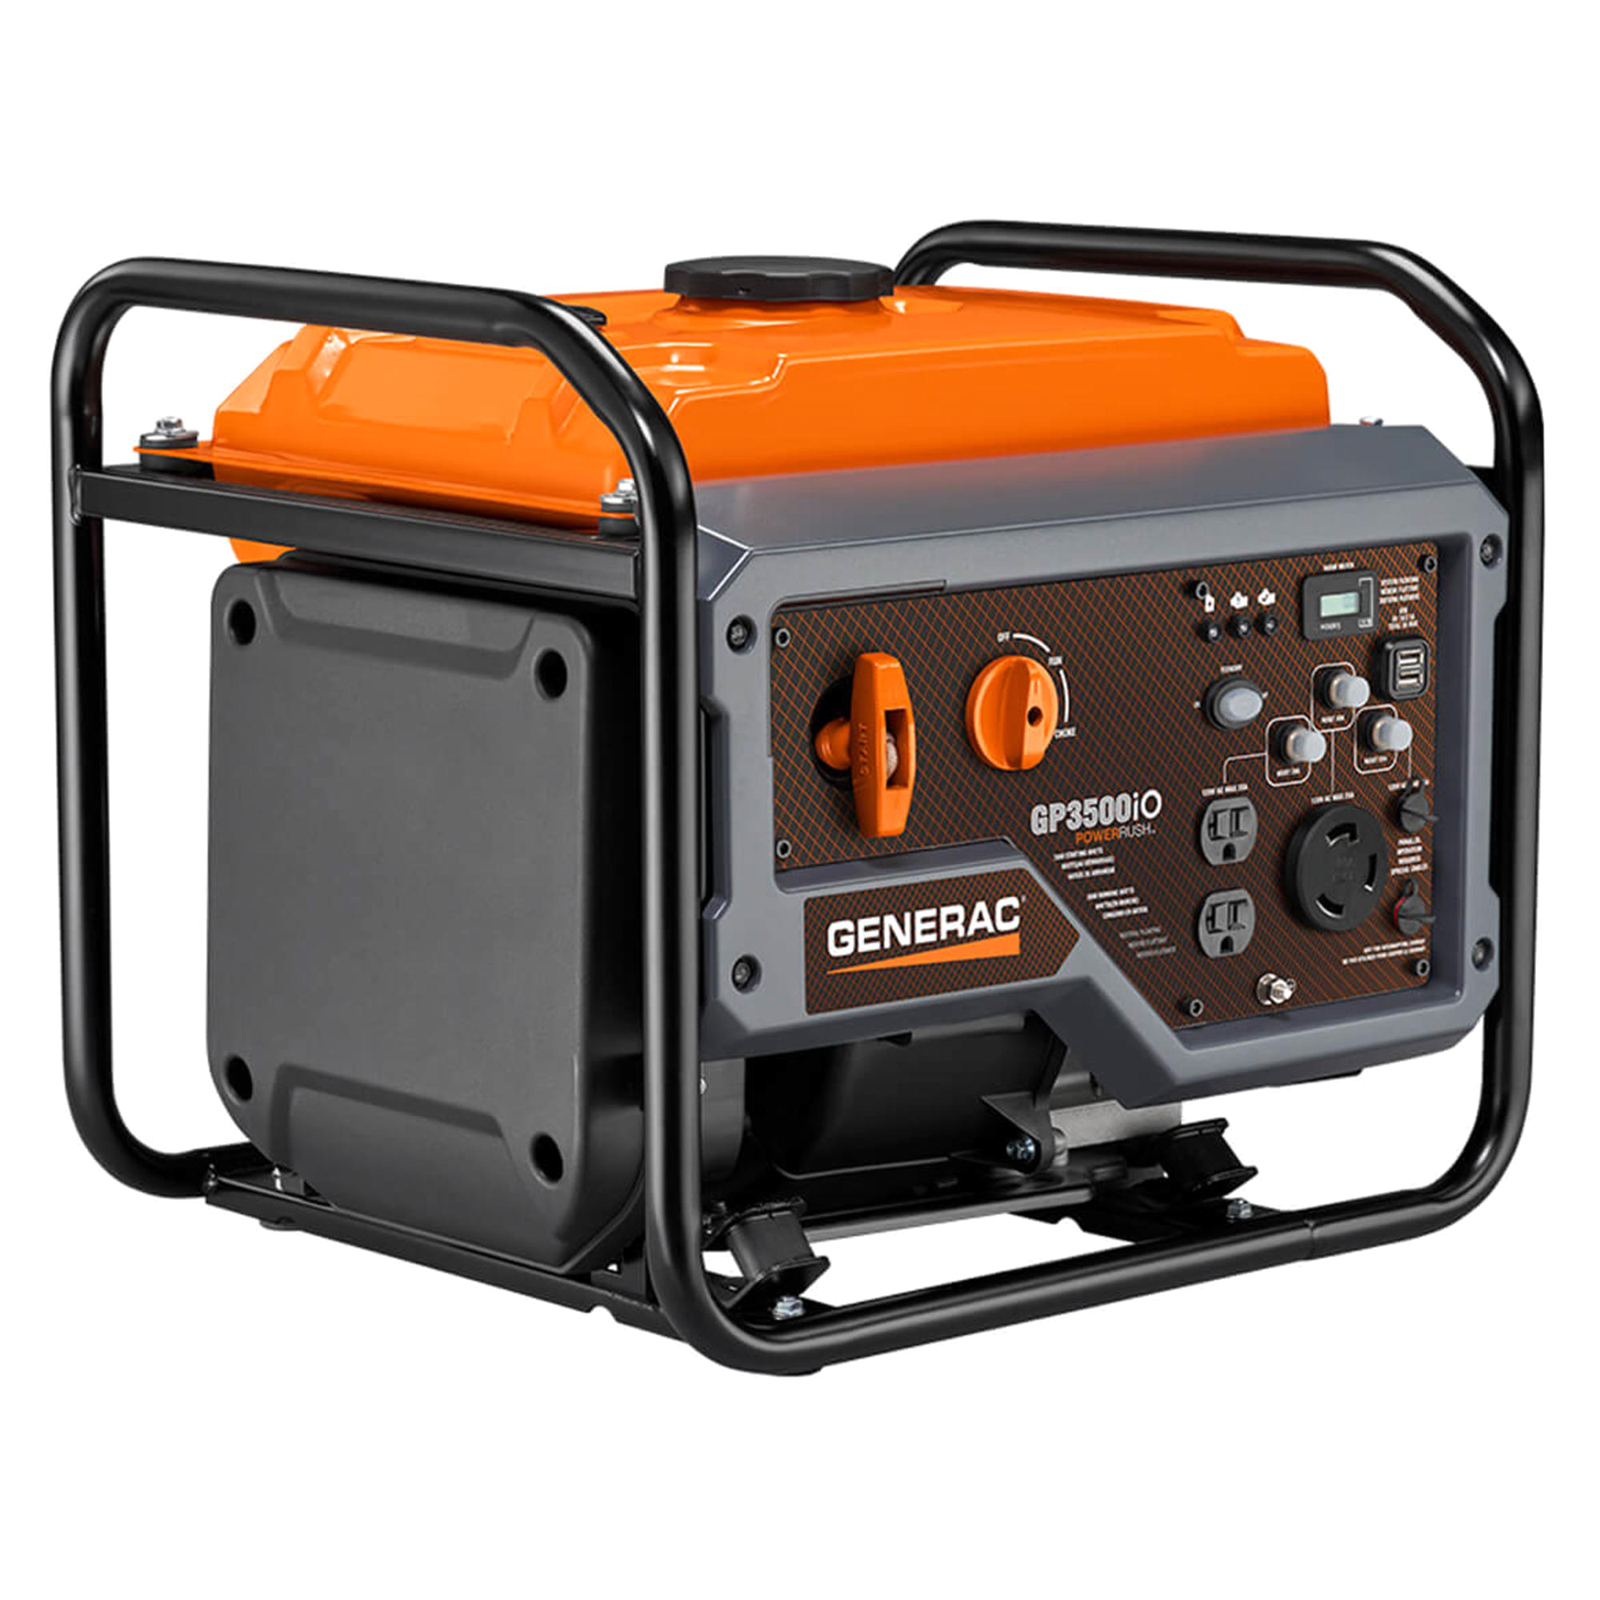 small resolution of generac 7128 gp series 3500io 3500w portable generator with economy mode